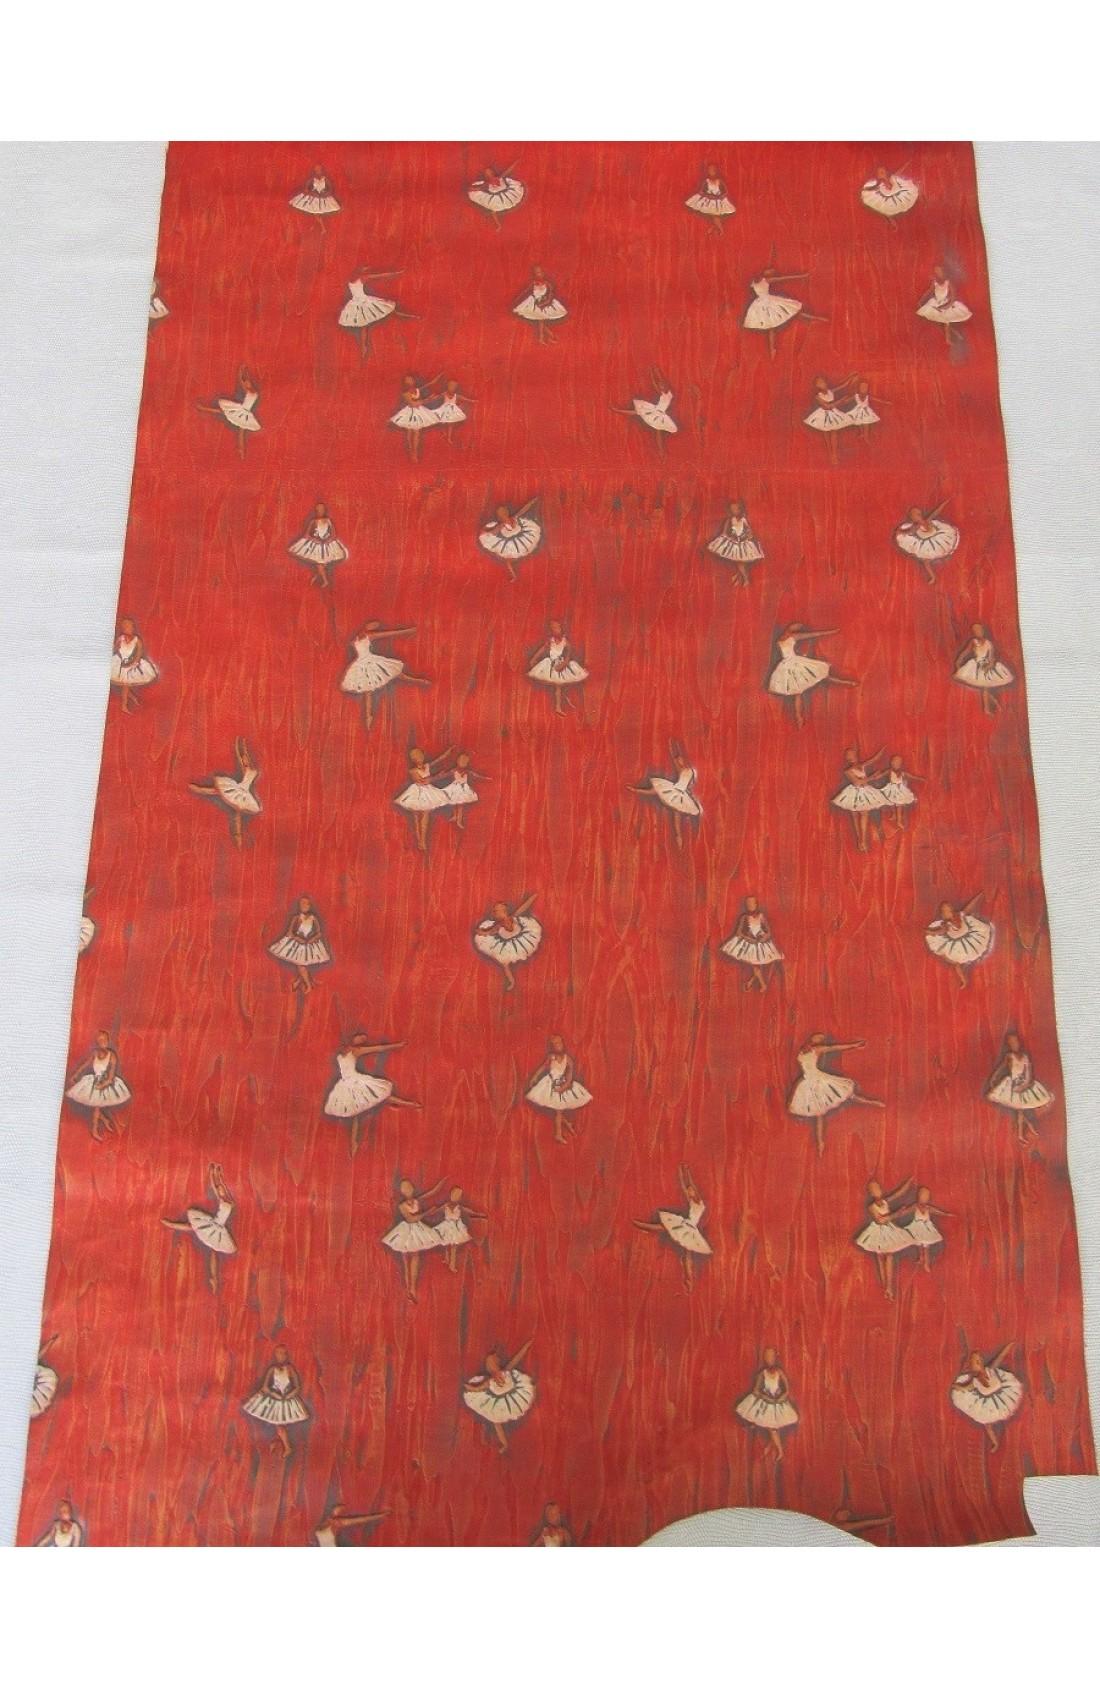 art. 34 BALLERINE stampa su vitello var.71 rosso